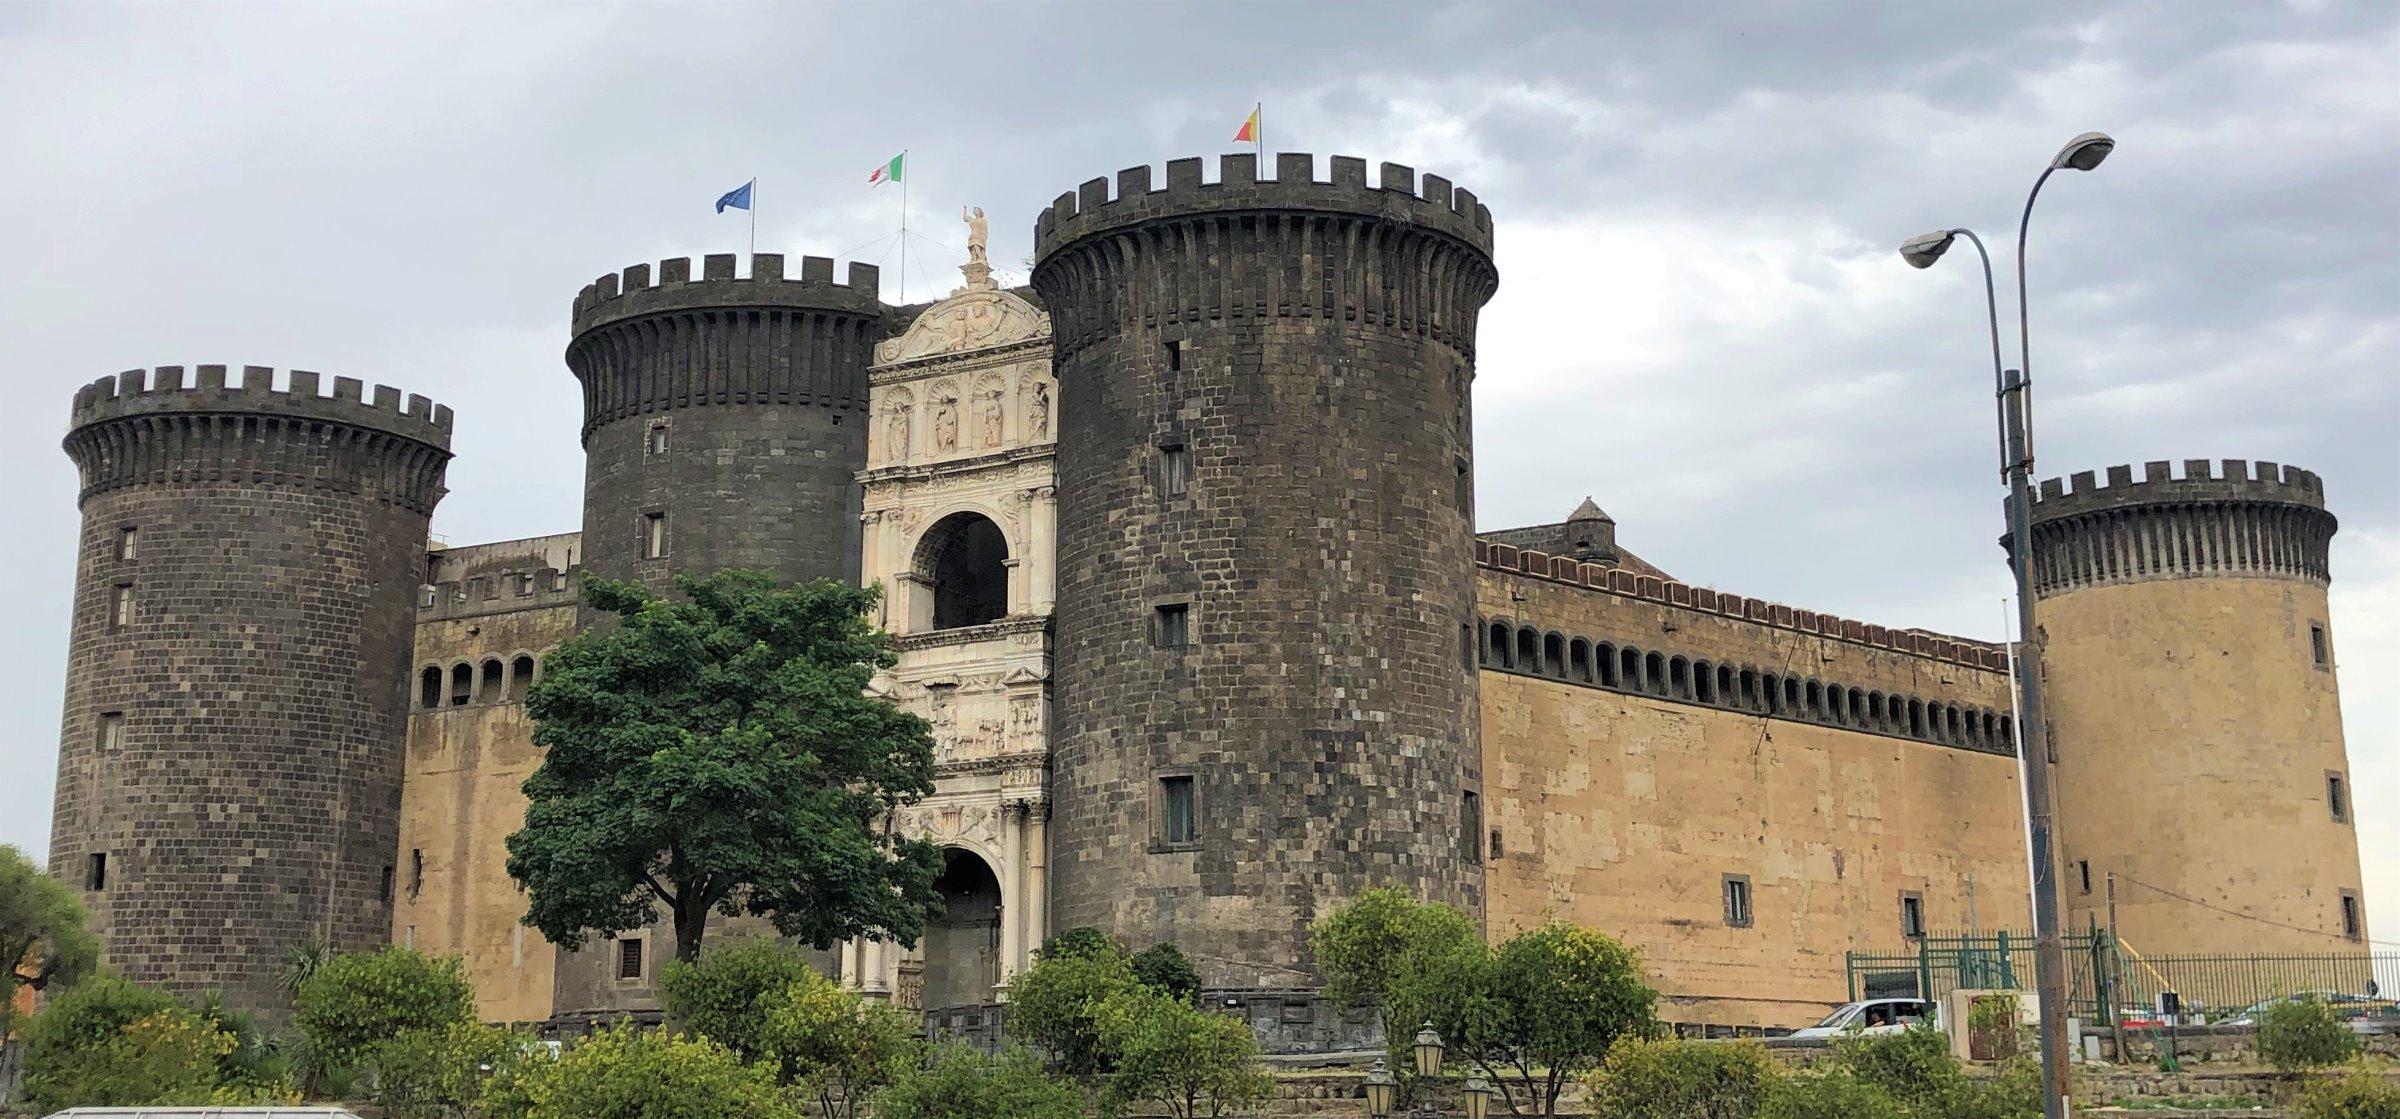 Napoli borg